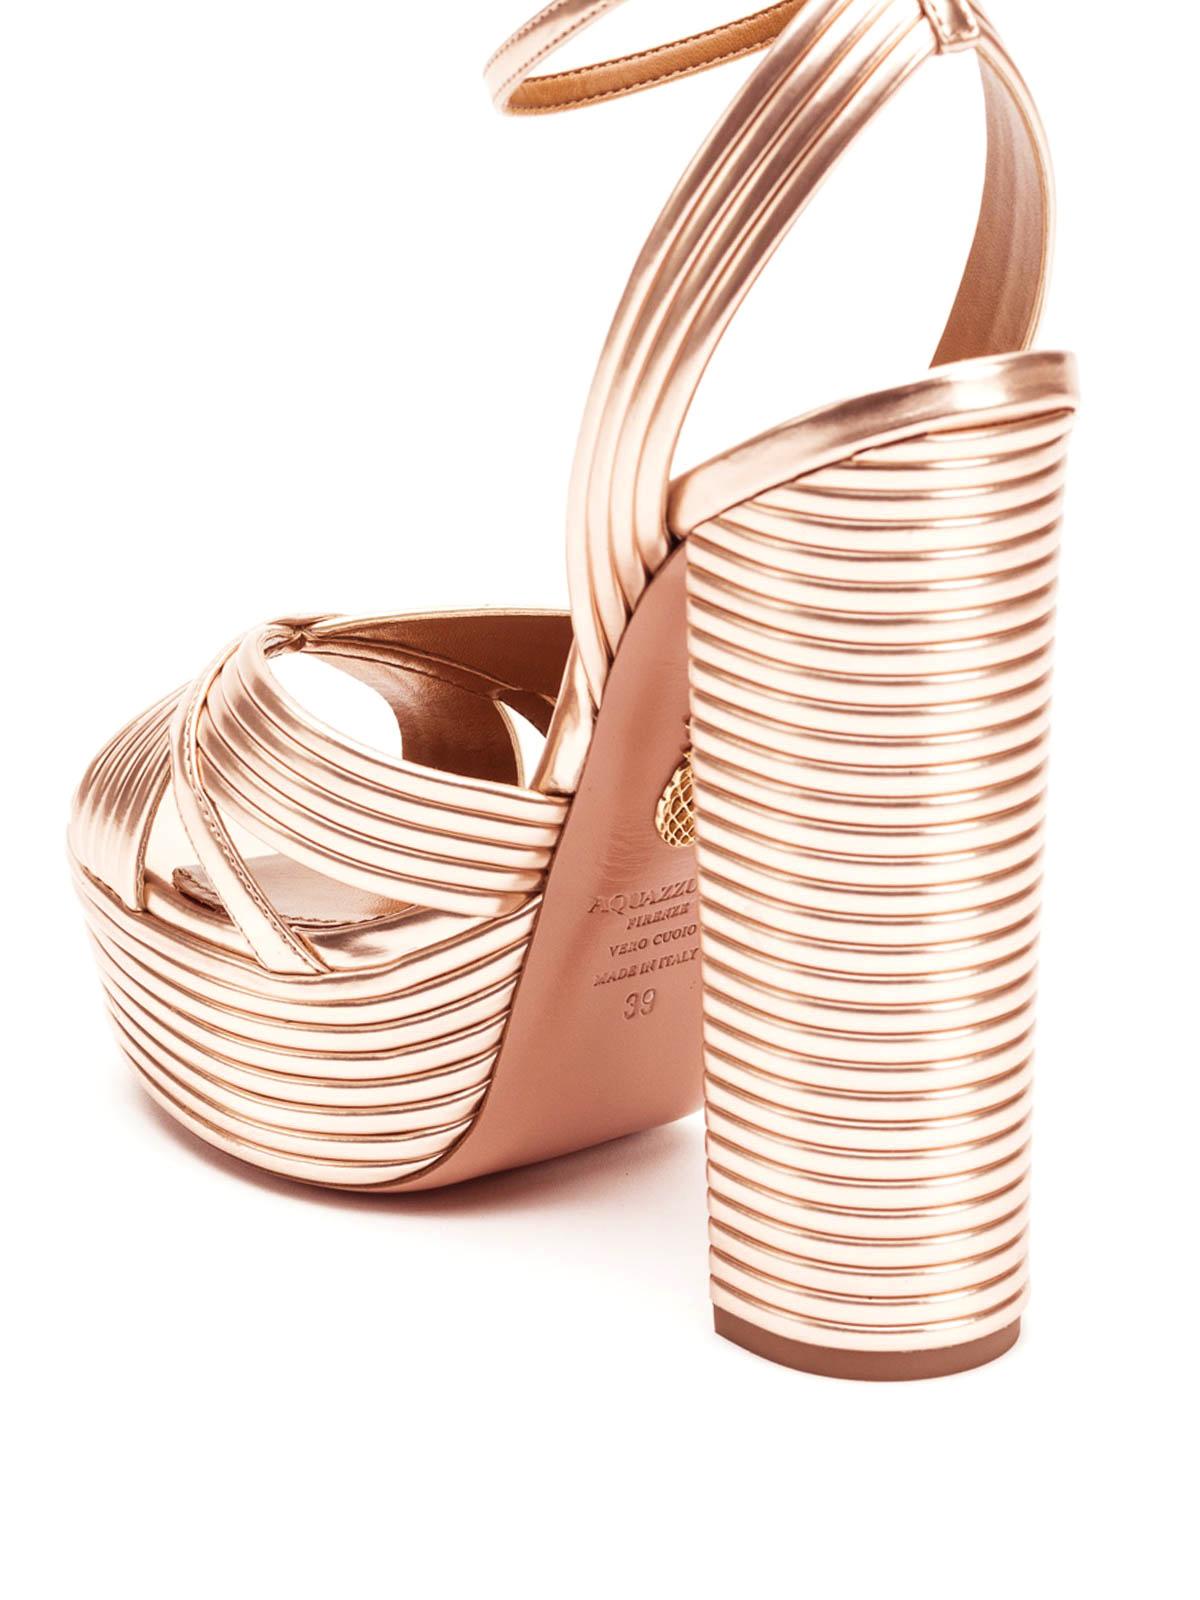 bbcb94af8d Aquazzura - Sundance metallic leather platform sandals - sandals ...